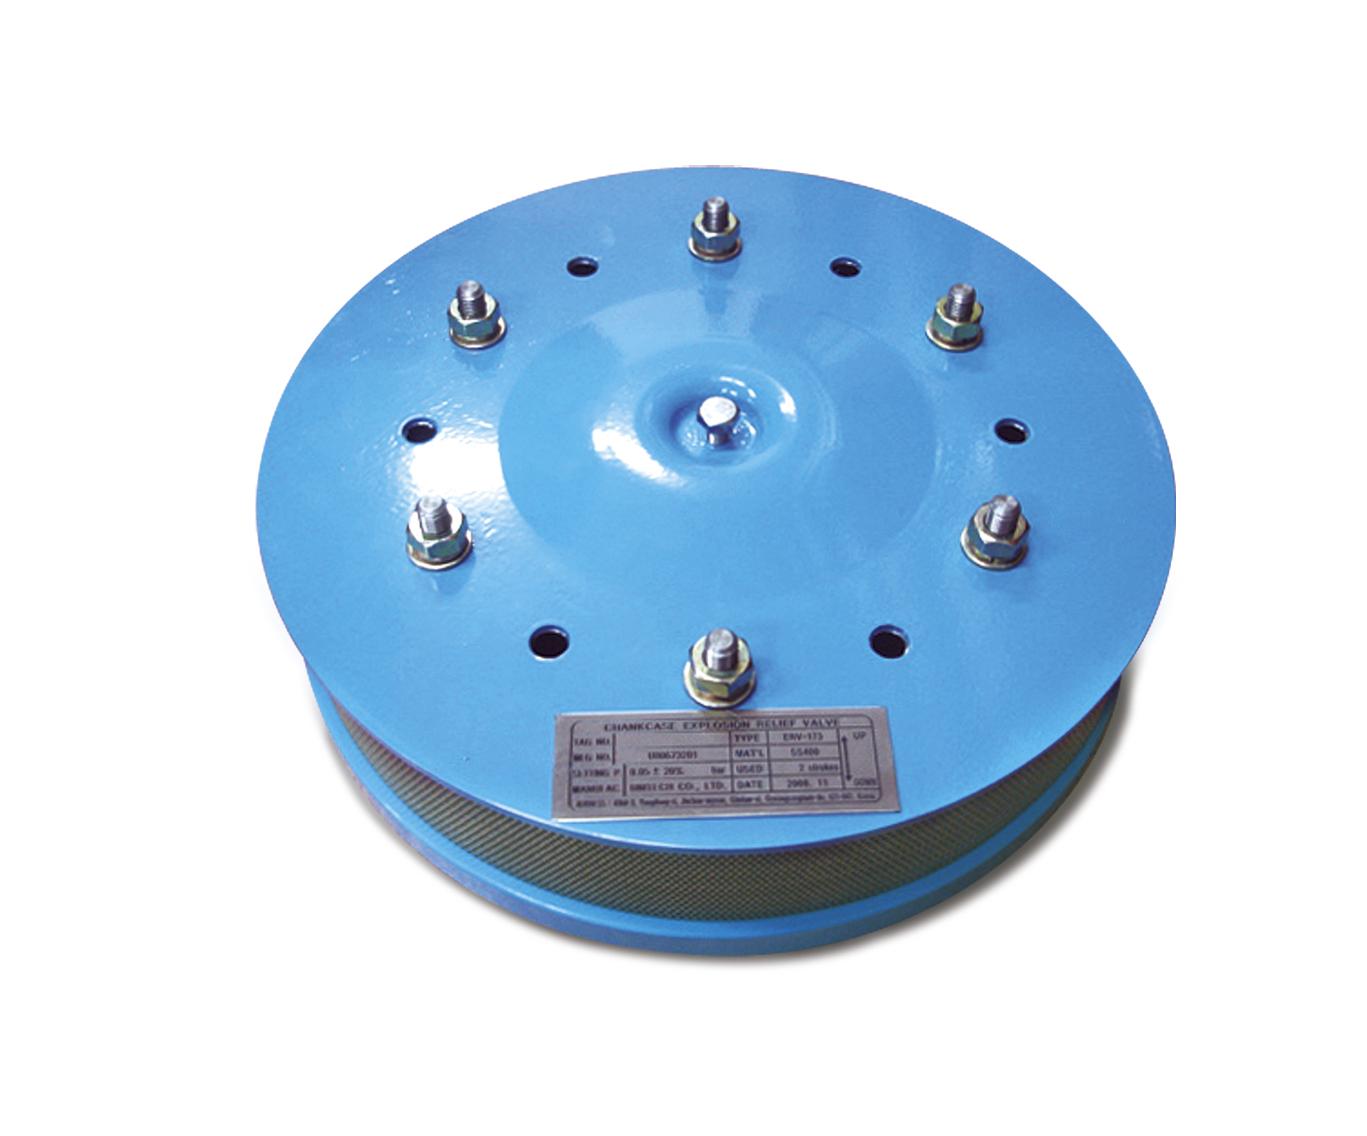 Crankcase explosion relief valve